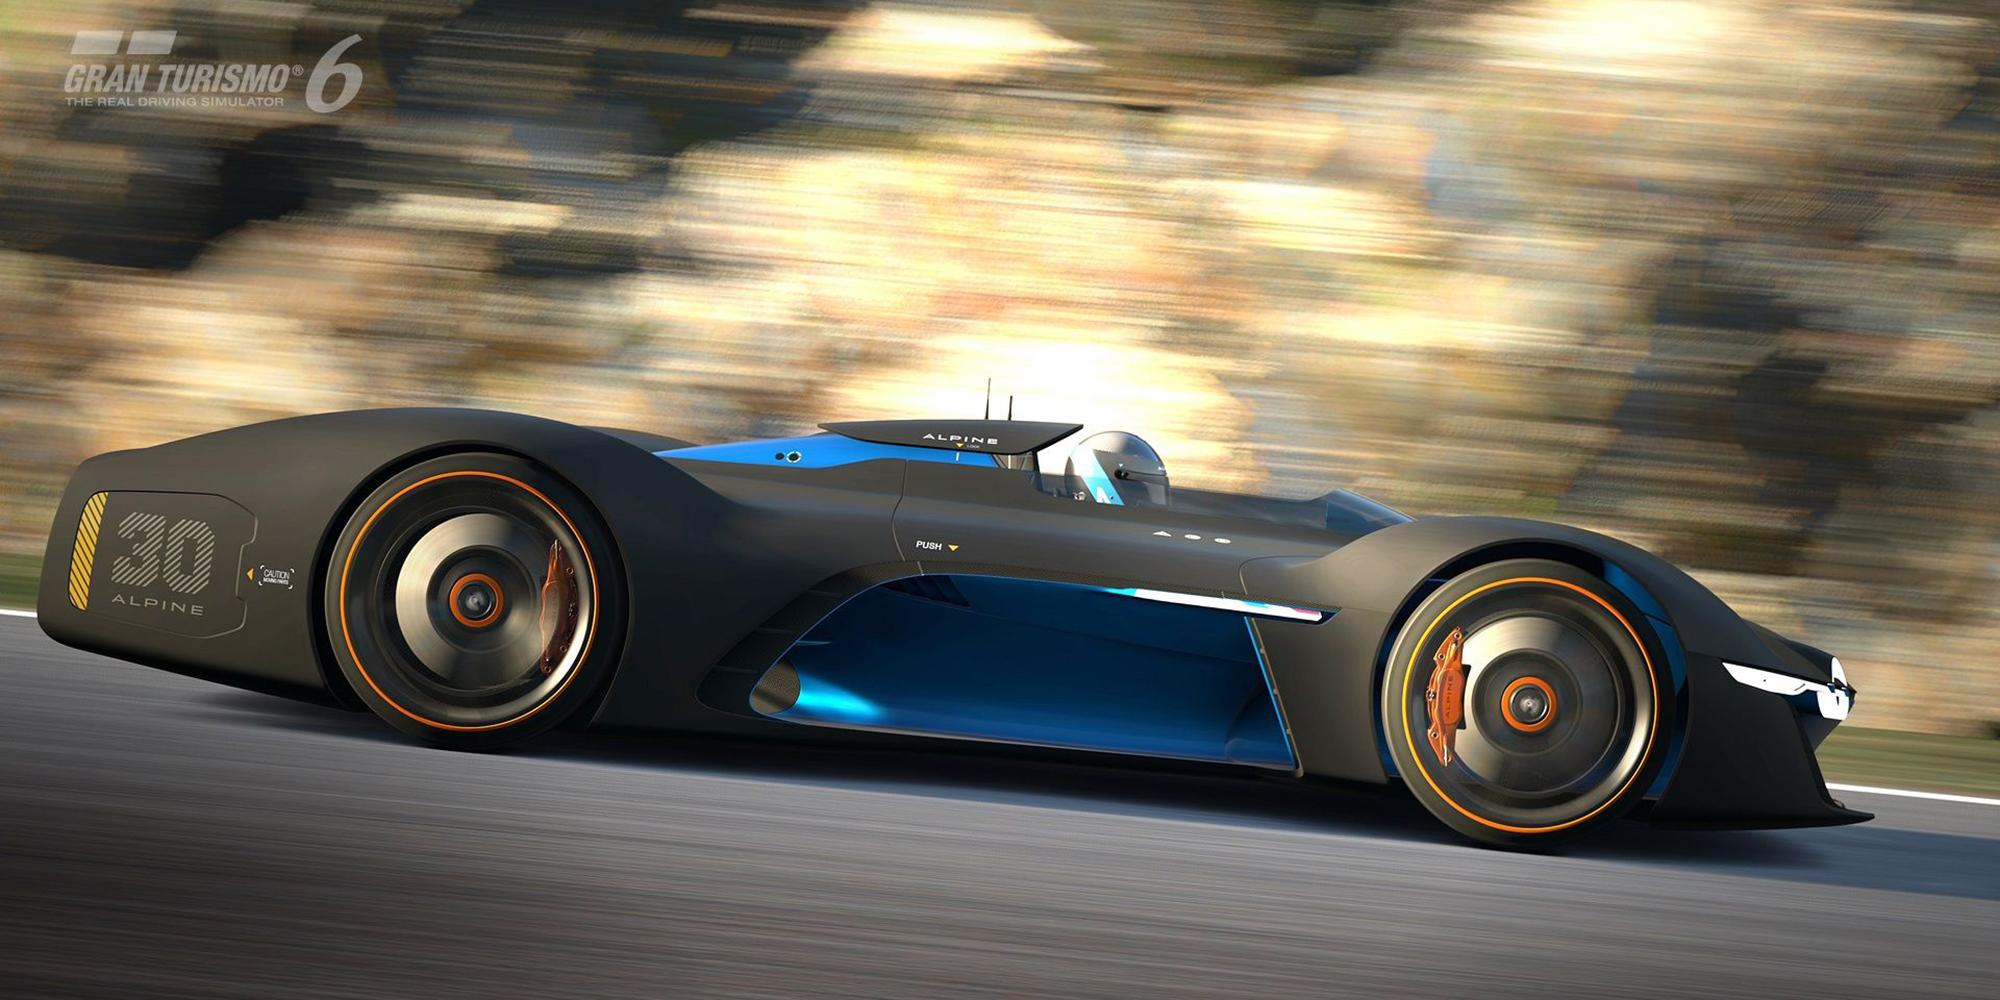 Alpine Vision Gran Turismo, Prototyp, Renault, Design, 2015